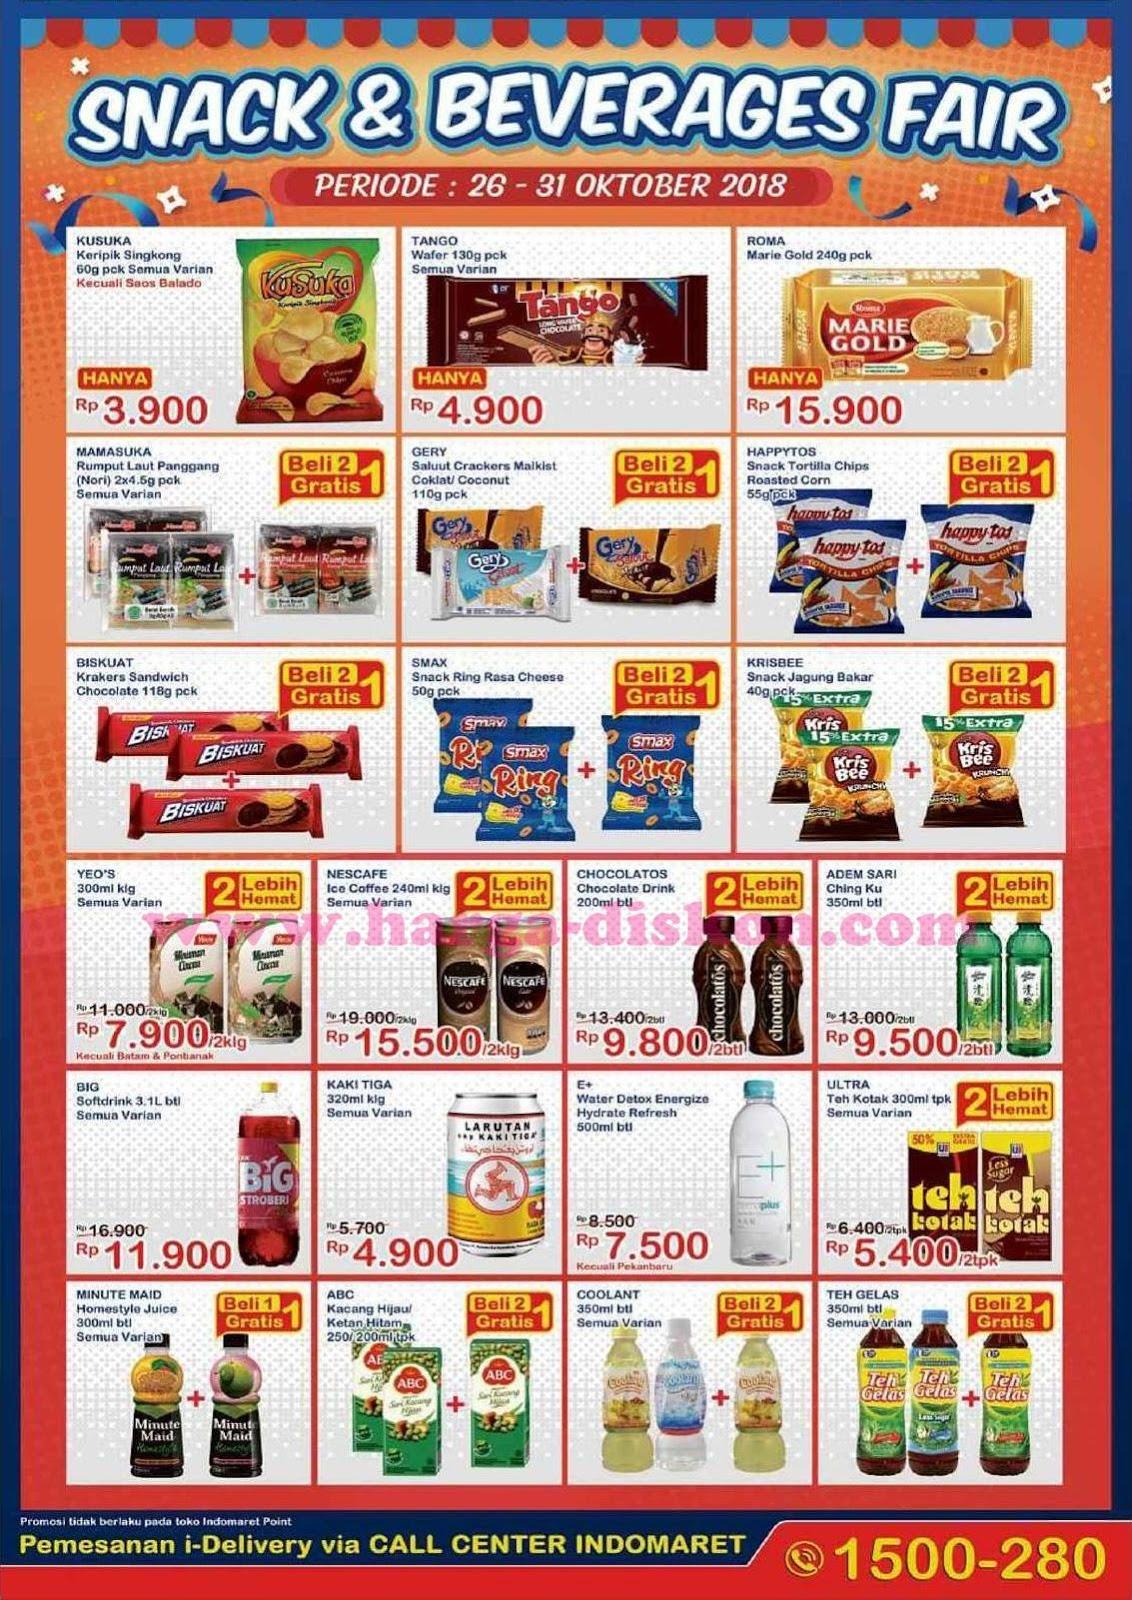 Katalog Promo Indomaret Snack Beverages Fair Periode 26 31 Oktober 2018 Inilahpromo Com